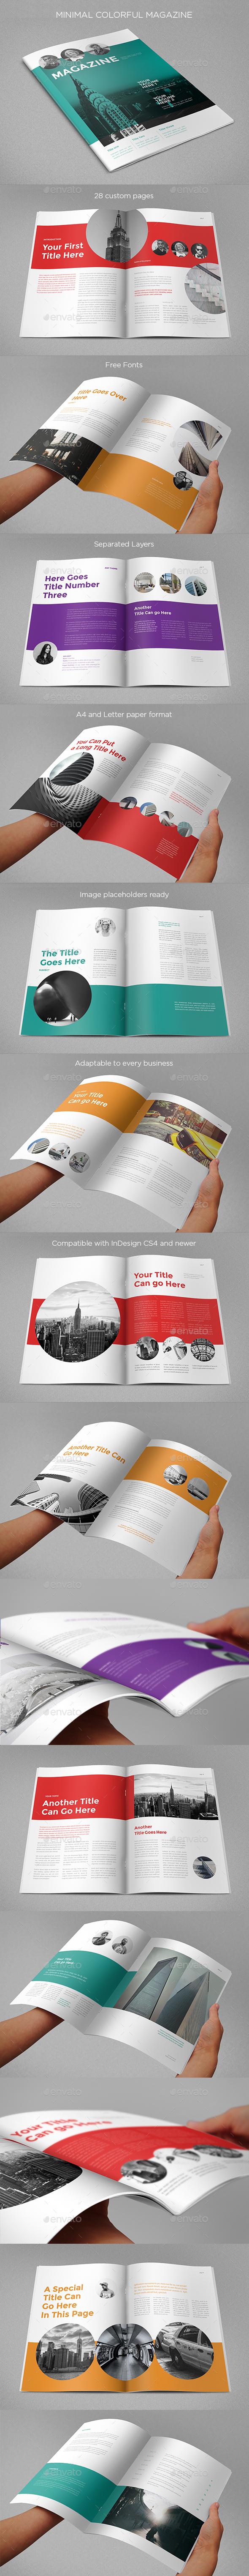 Minimal Colorful Magazine - Magazines Print Templates